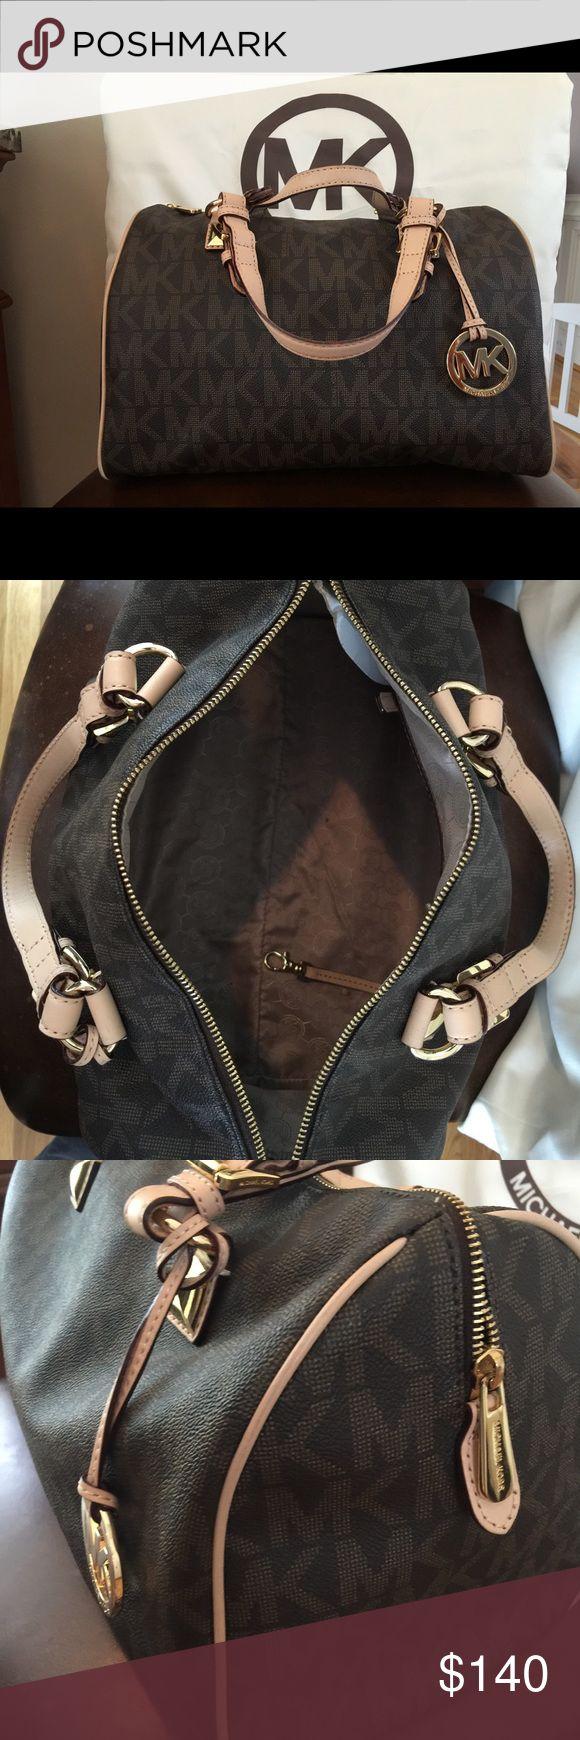 Michael KORS Grayson Leather Satchel EUC! Used a few times. Comes with duster bag. Smoke free home. KORS Michael Kors Bags Totes